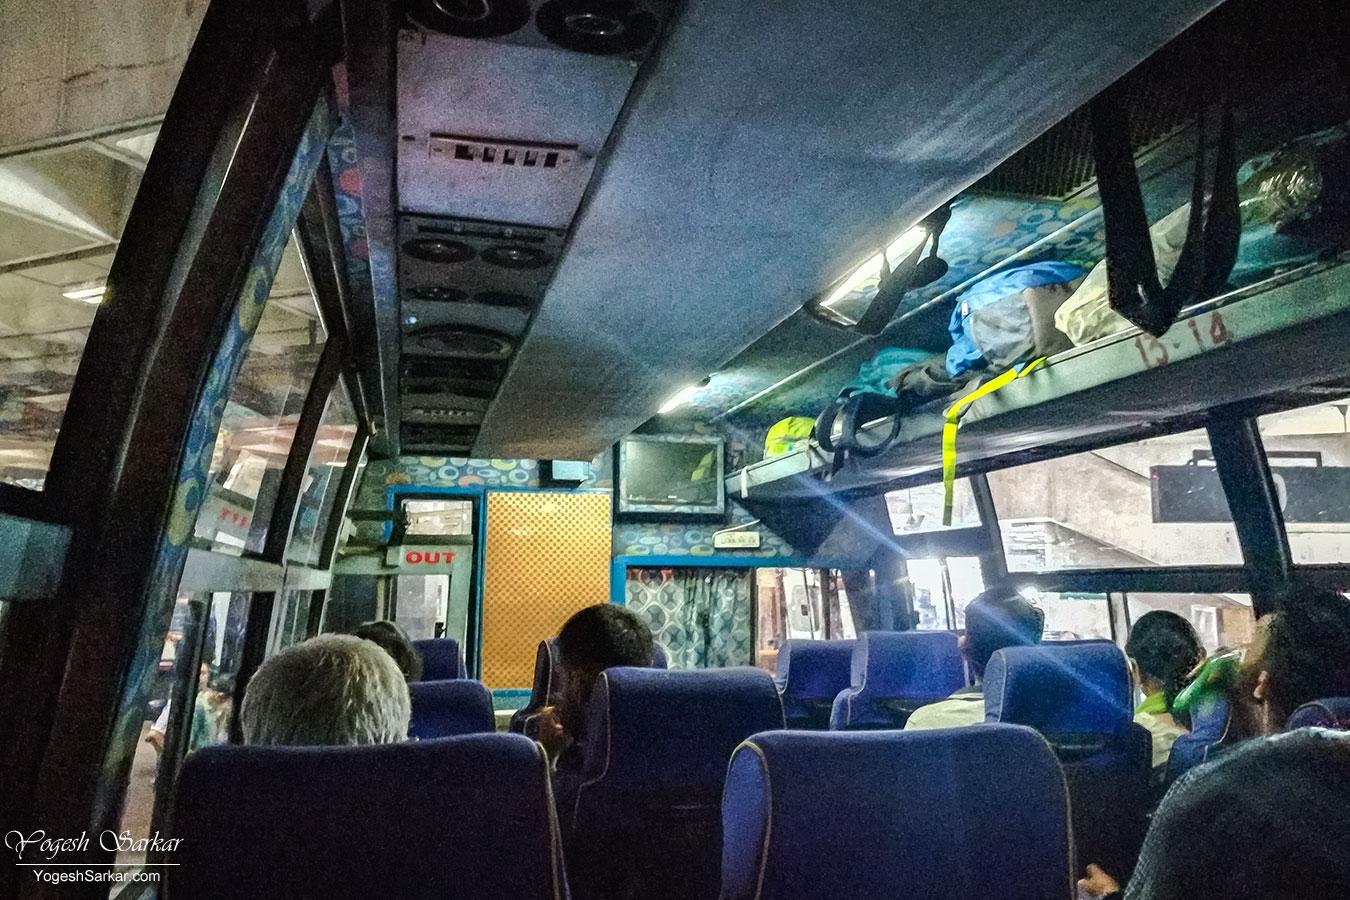 01-hrtc-ac-bus-delhi-rampur.jpg